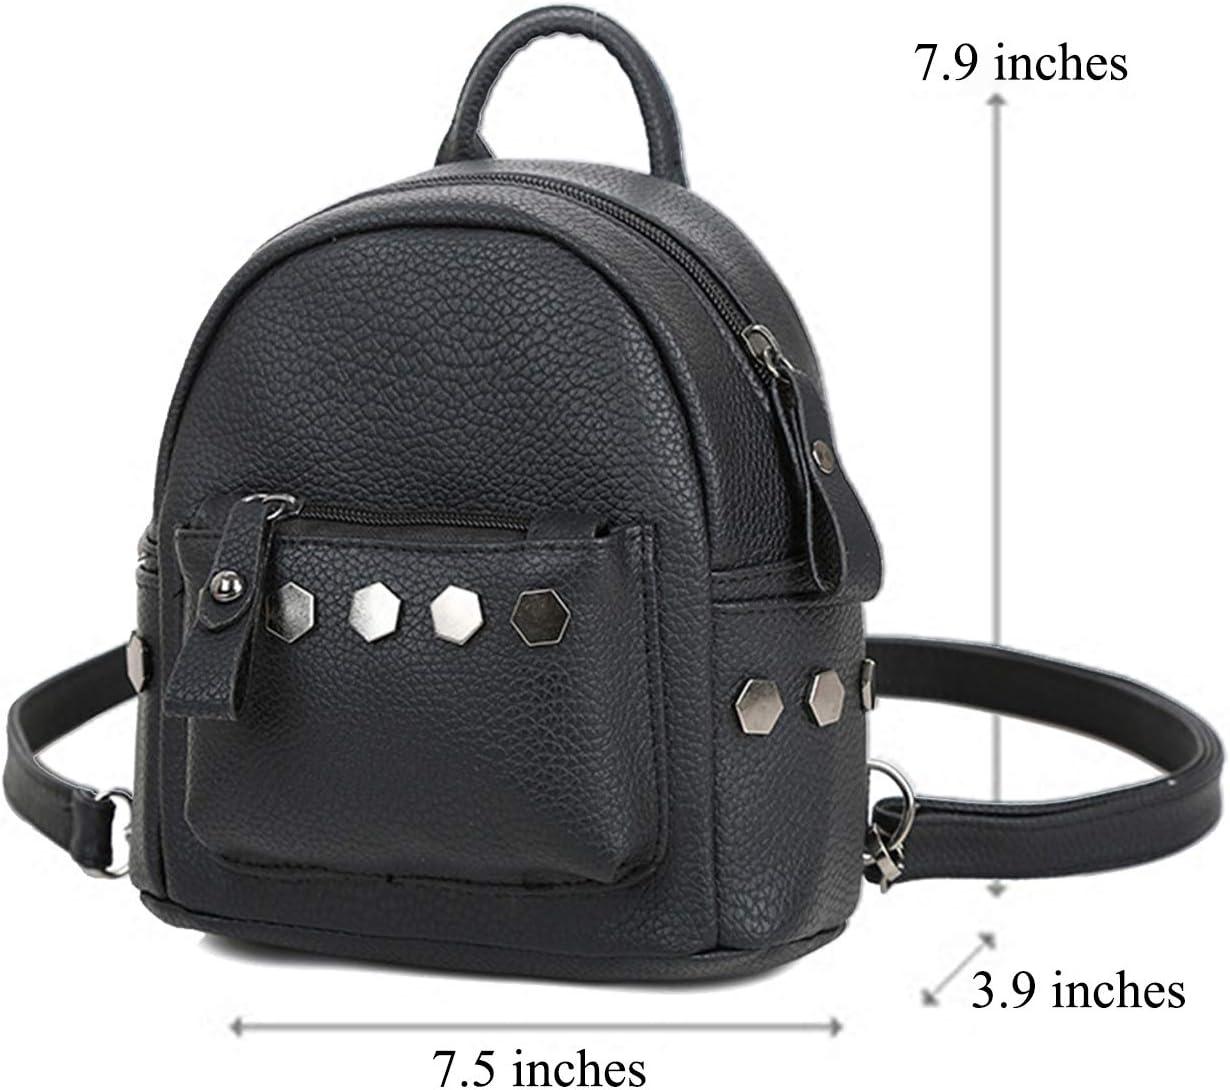 Black Hkiss PU Leather Studded Shoulder Mini Backpack